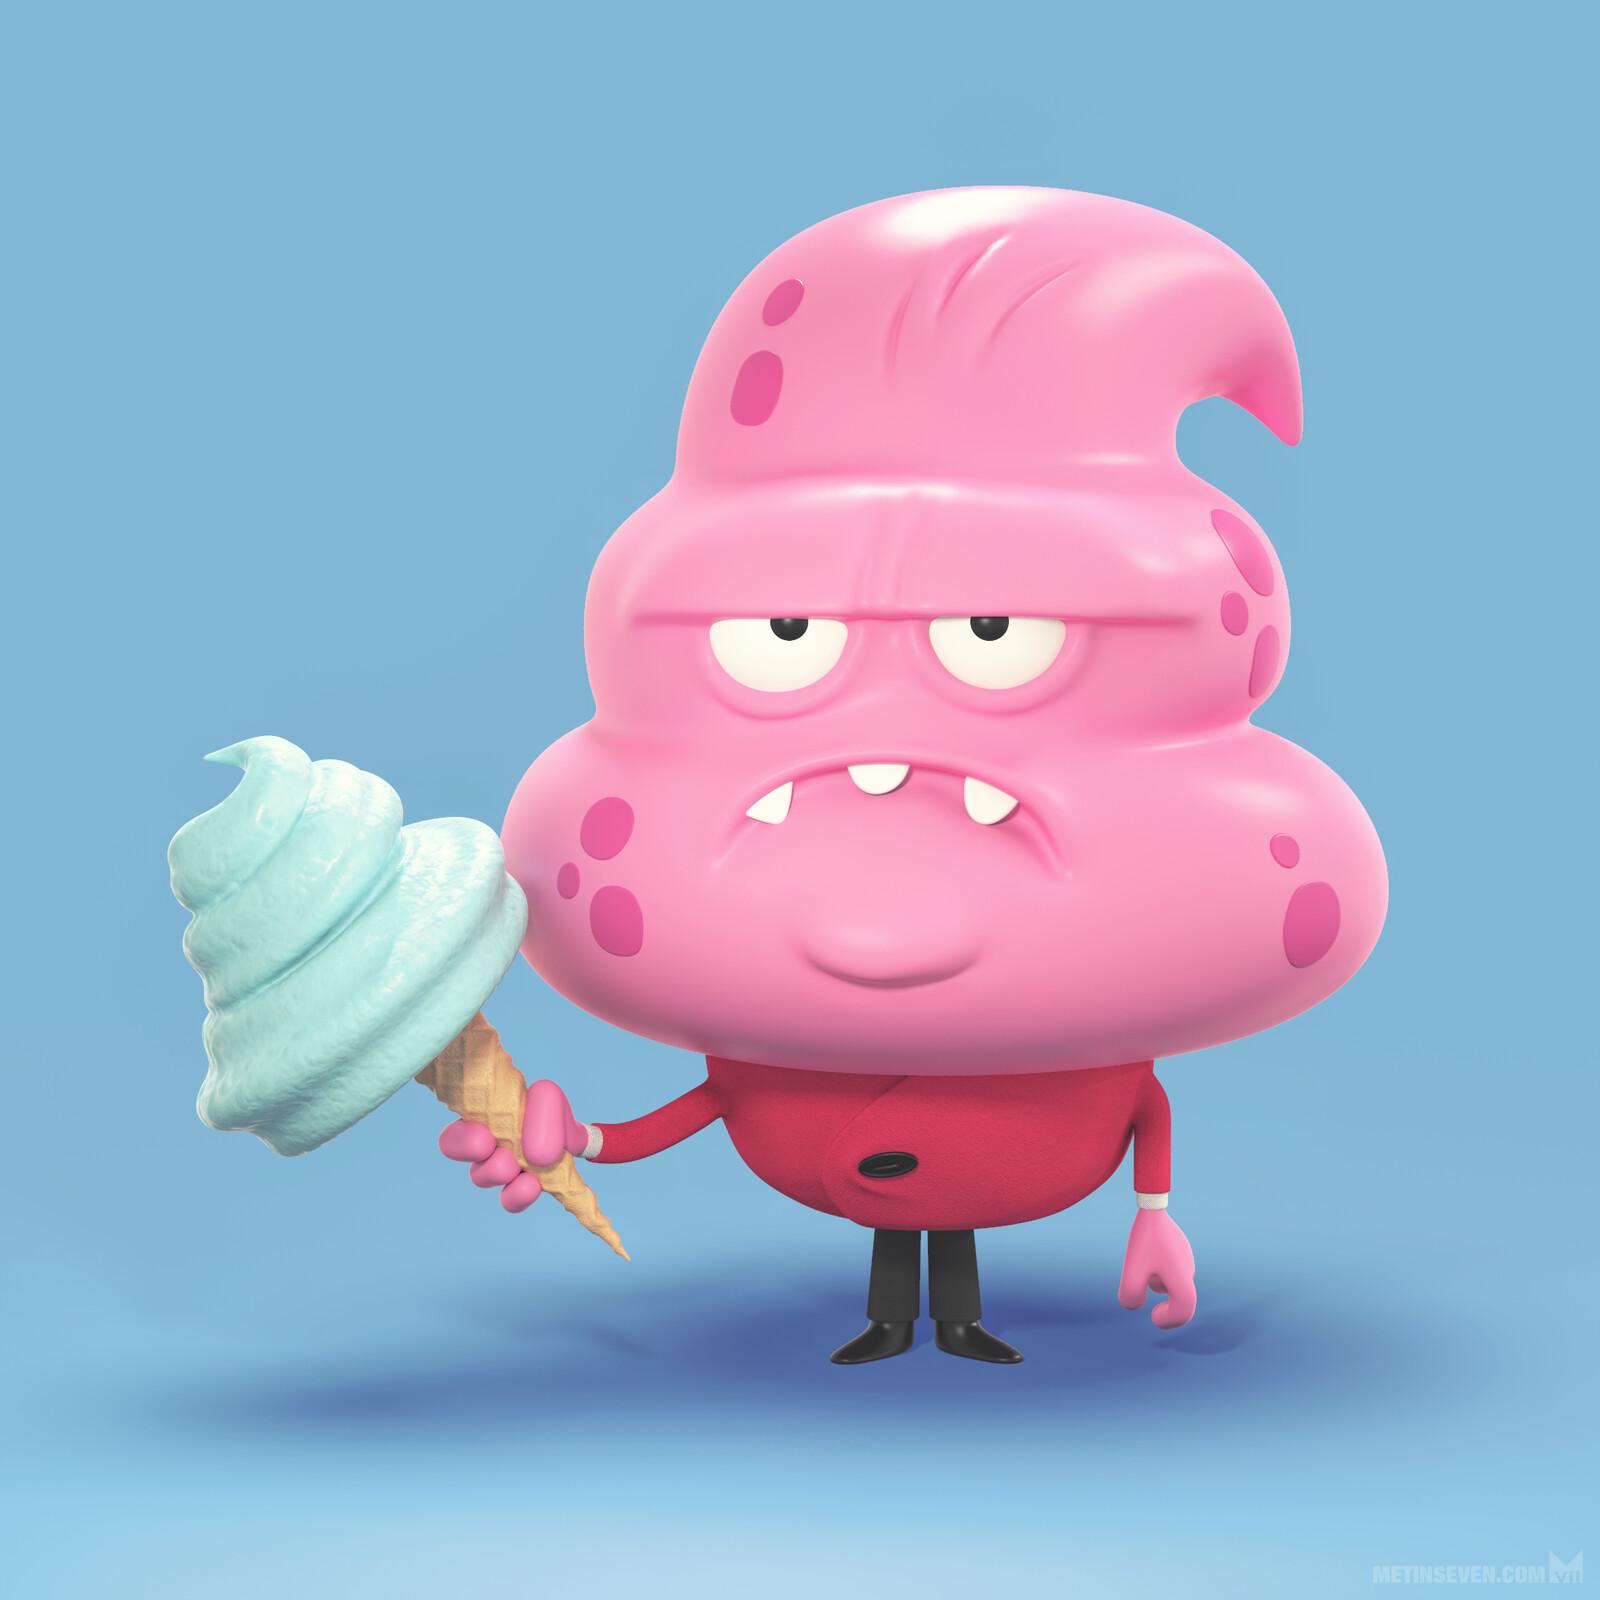 Ice cream monster 🍦 | Concept: Paul Gill